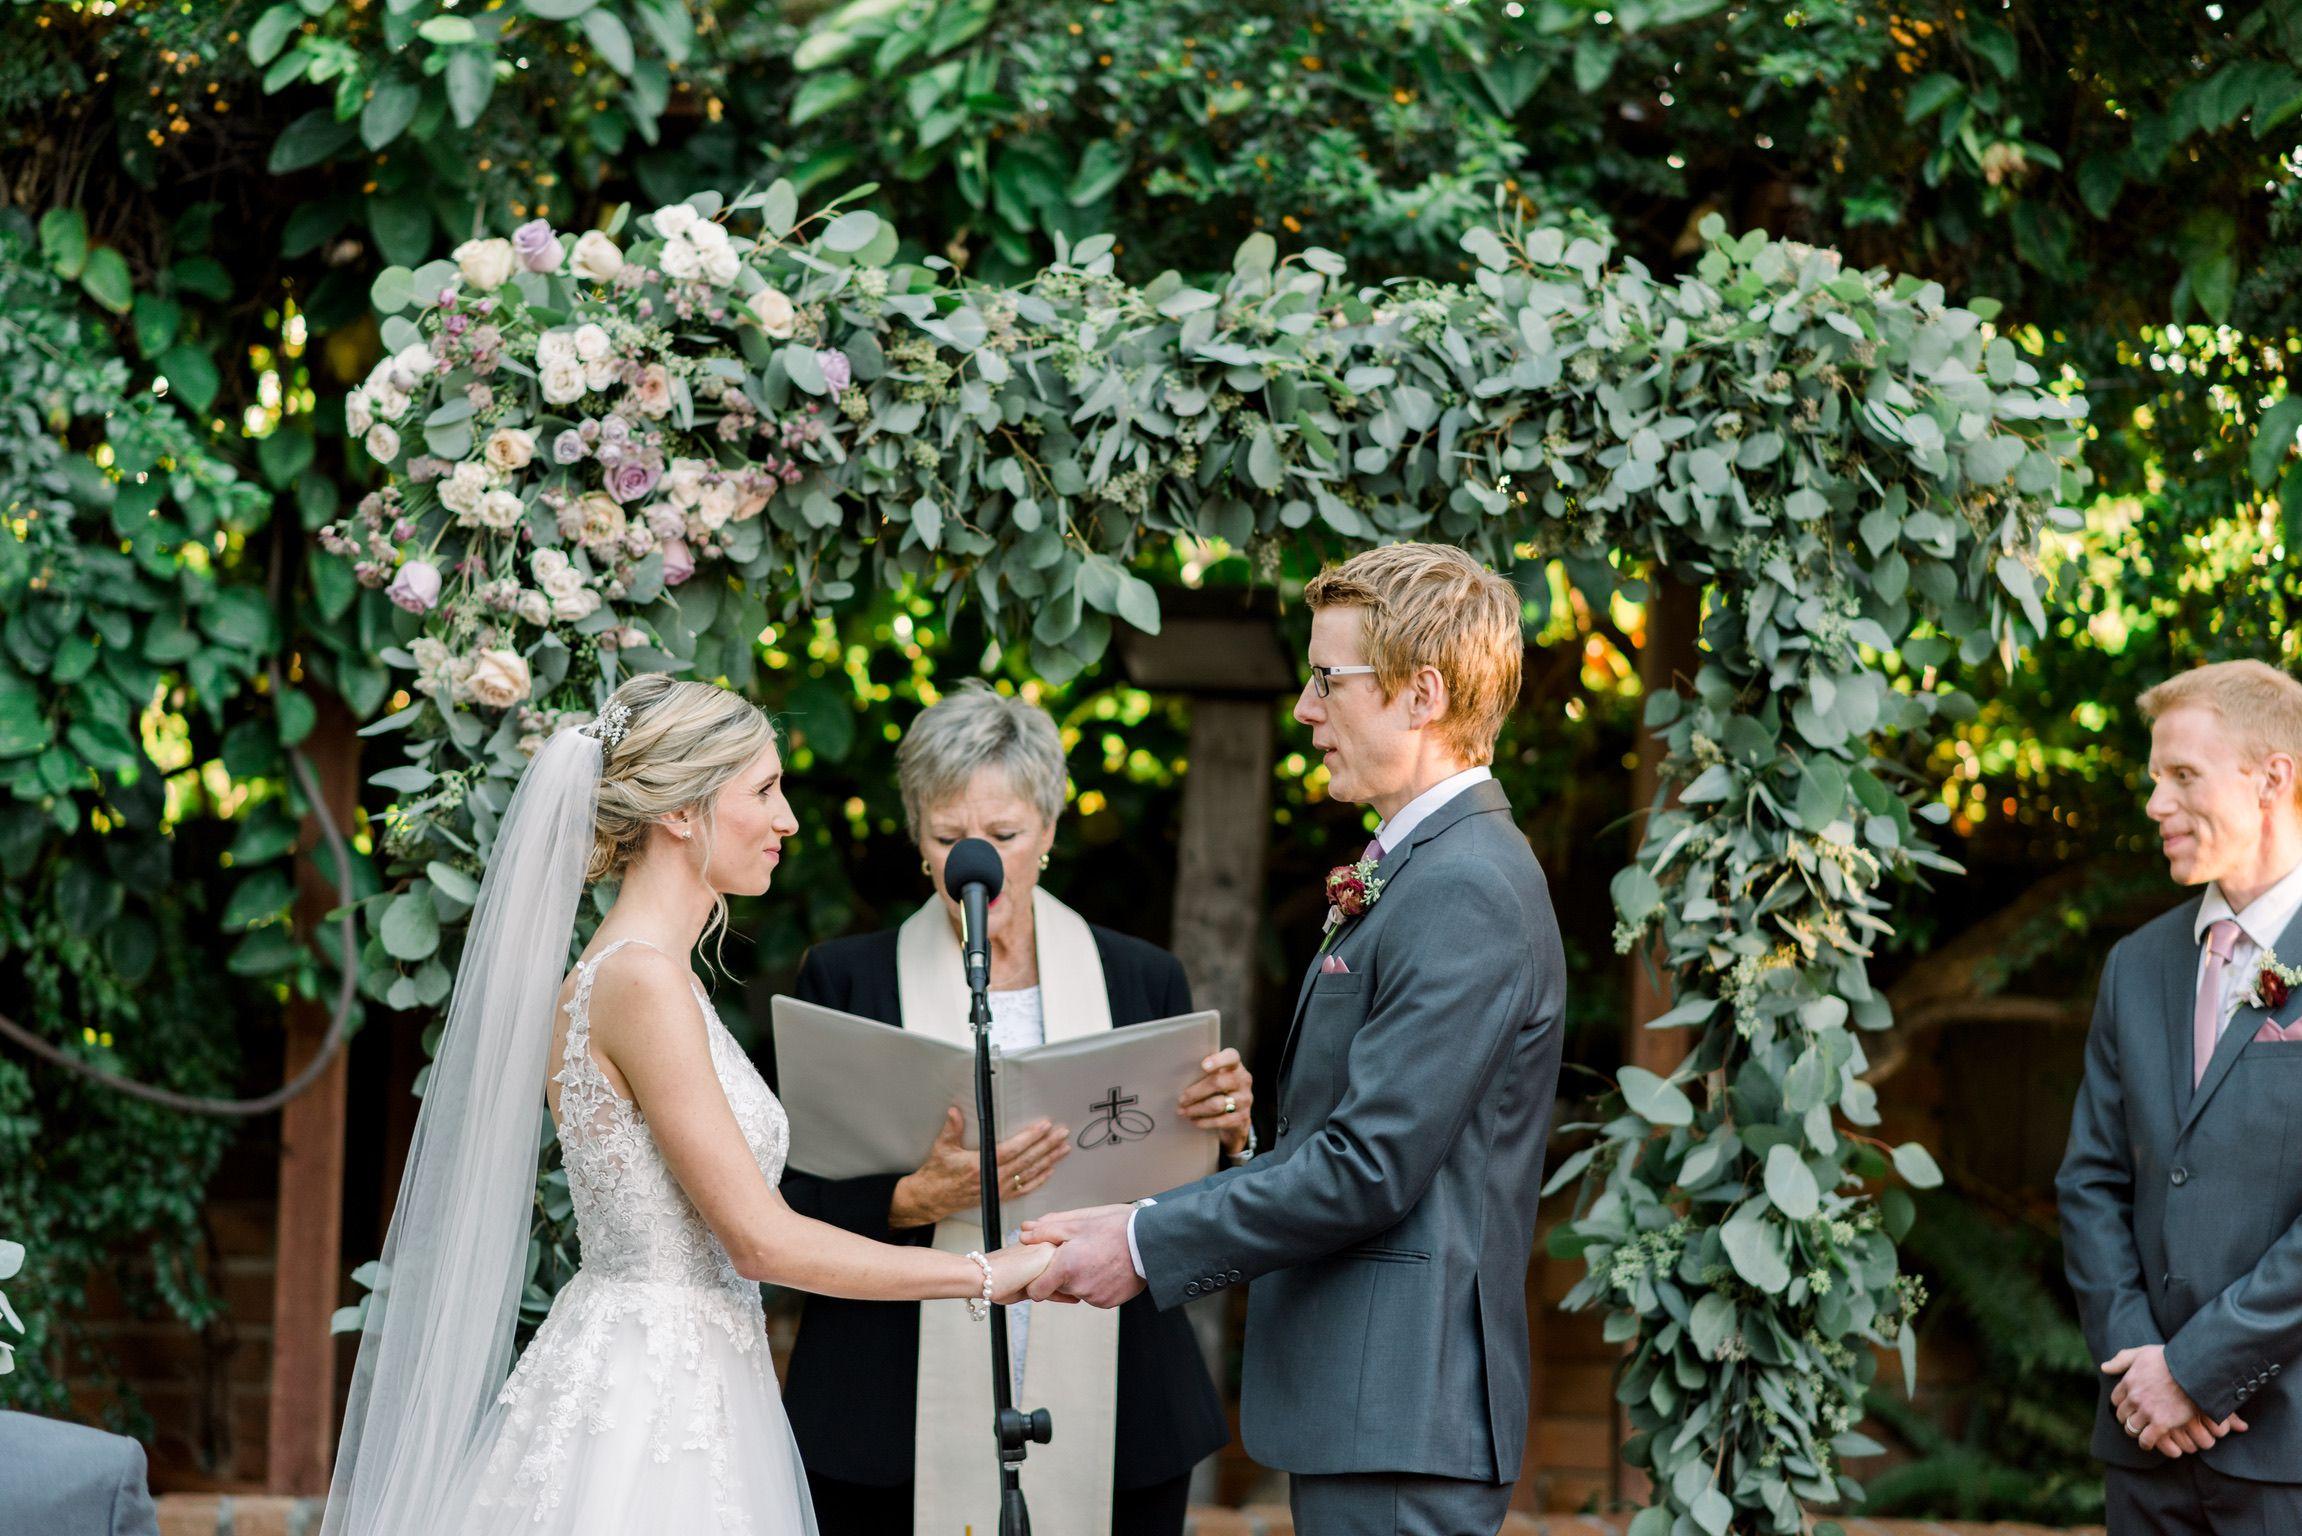 A London Boy And His American Bride In 2020 Wedding Officiant Wedding Bride Wedding Vows